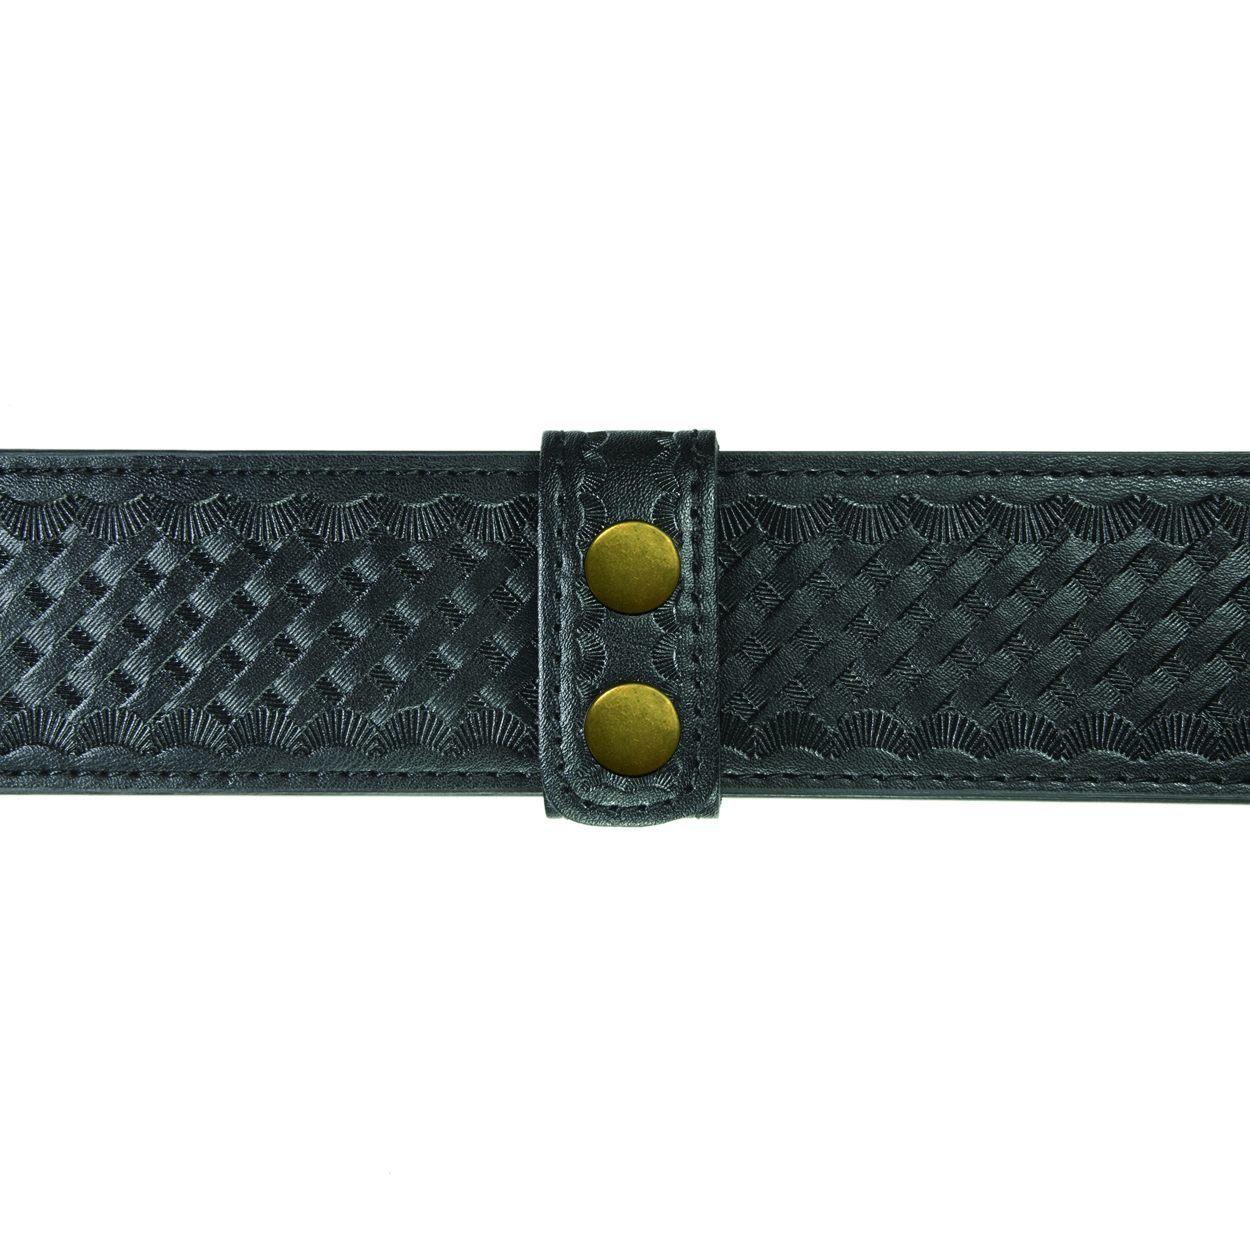 "Belt Keepers, 2 1/4"" Belt, 2 Pack, Deluxe, AirTek, BW, Gold Snaps"